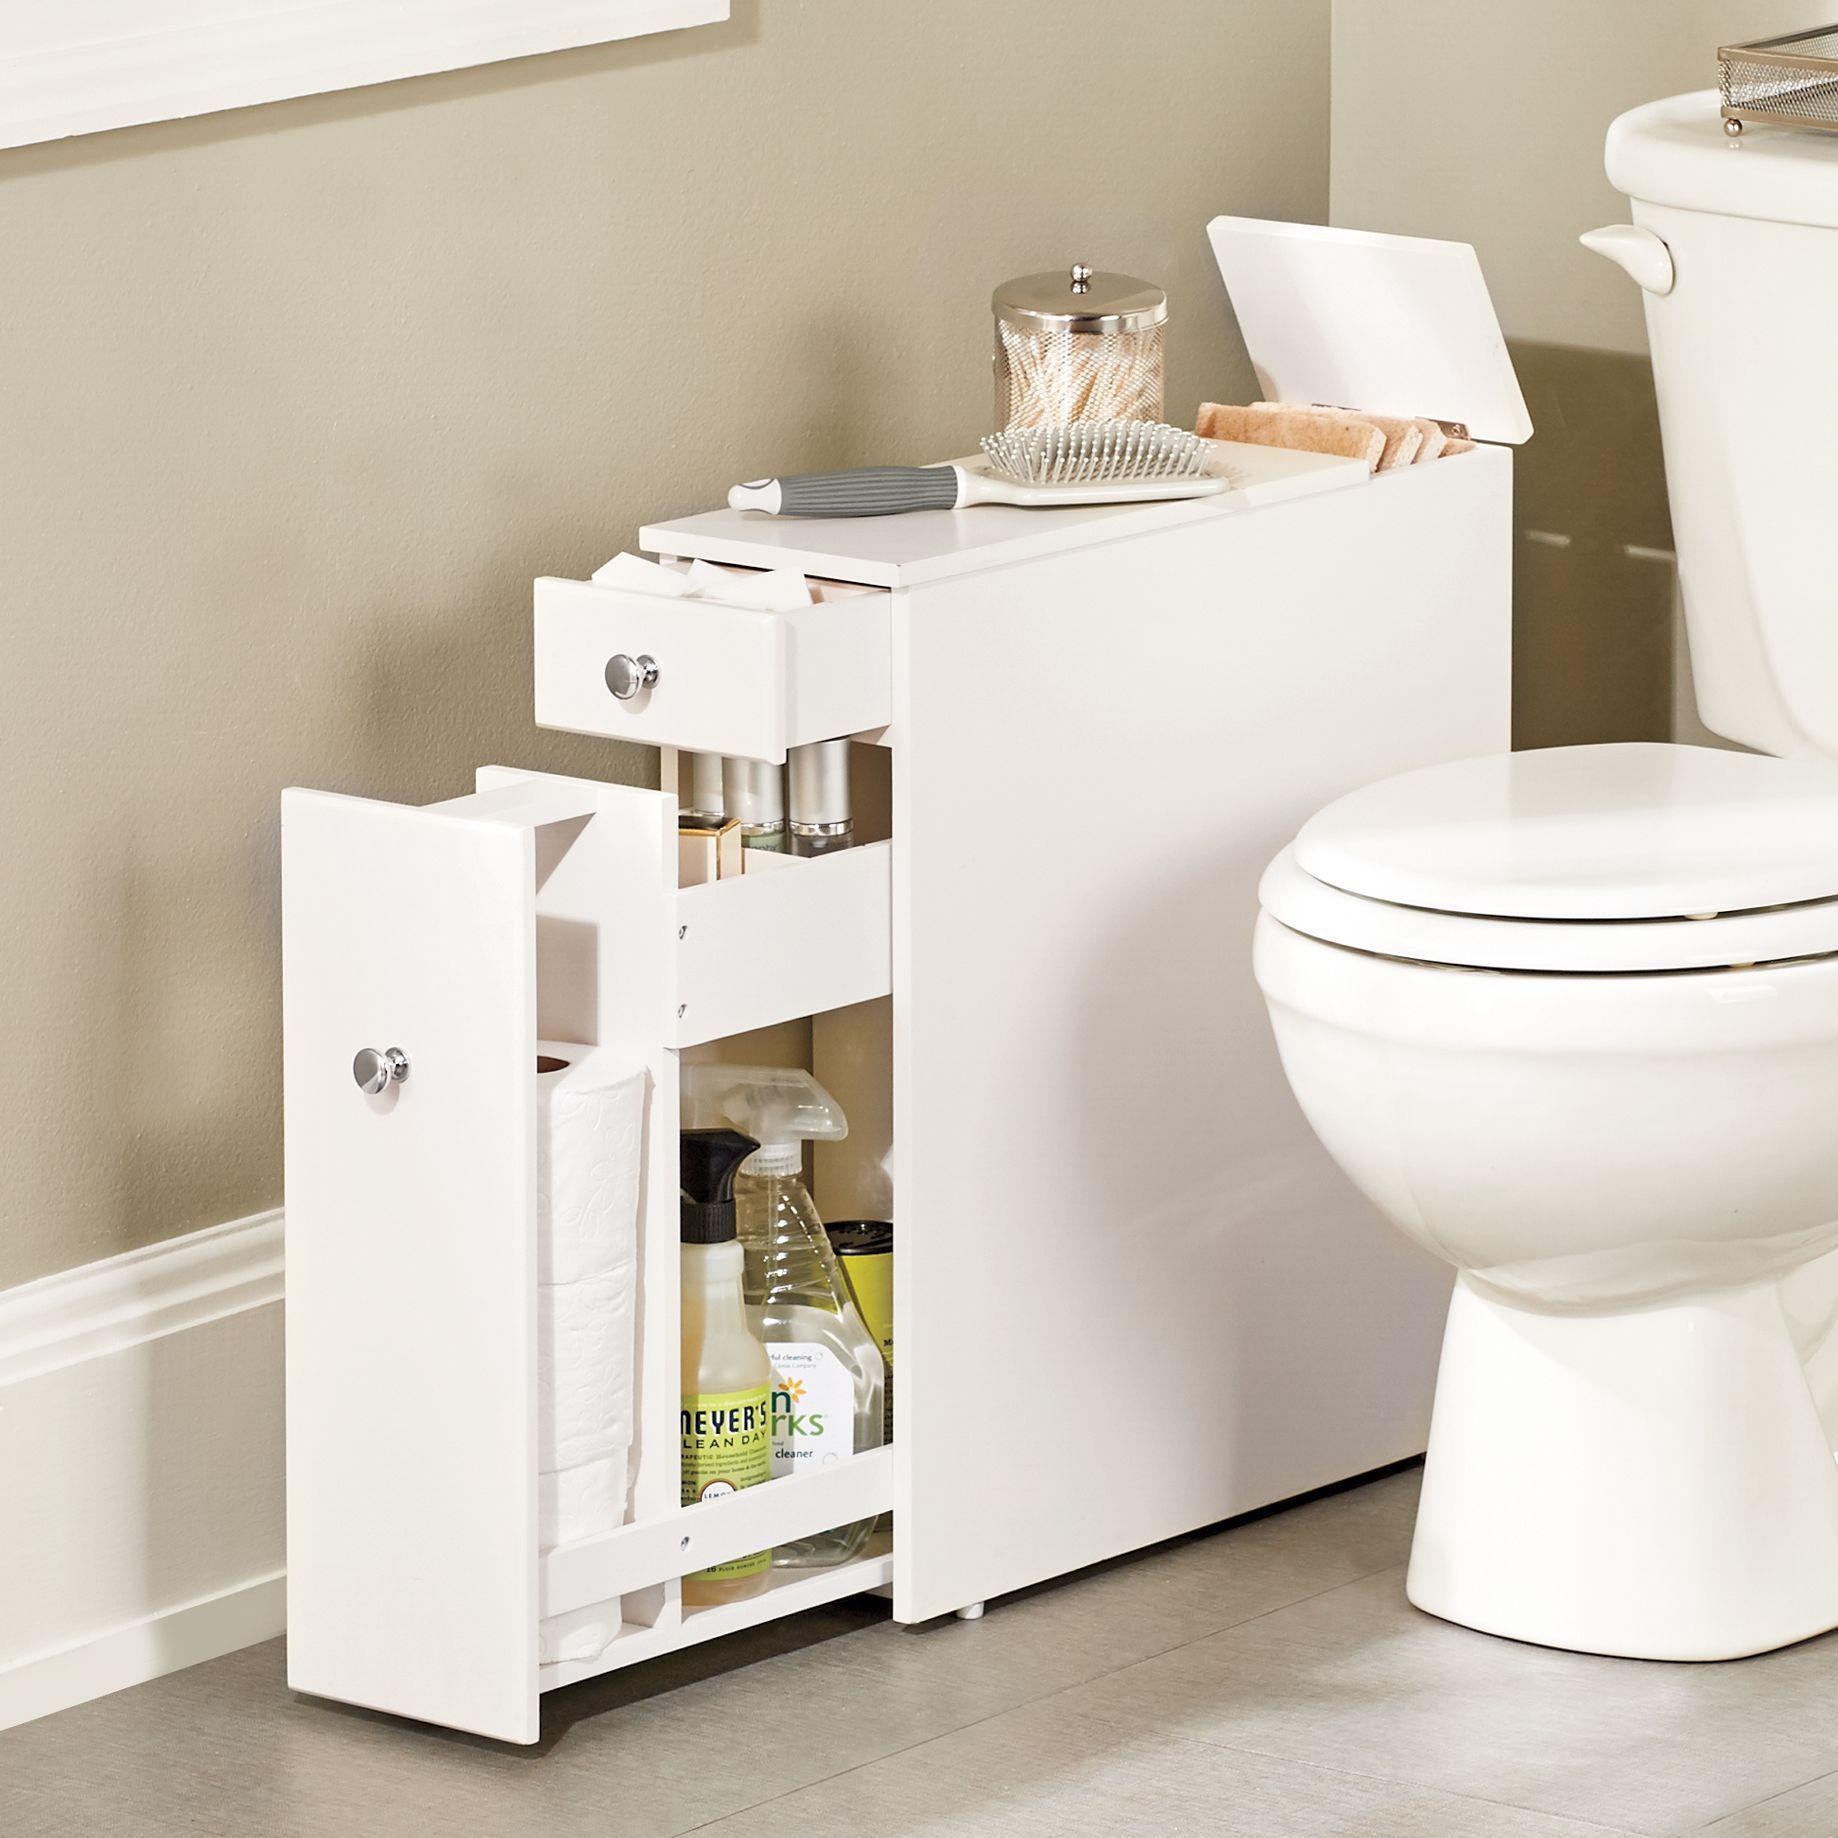 Bathroom Toilet Narrow Floor Storage Bath Cabinet Organizer Unit Side Table With Drawers Slim Storage Cabinet Slim Bathroom Storage Clever Bathroom Storage